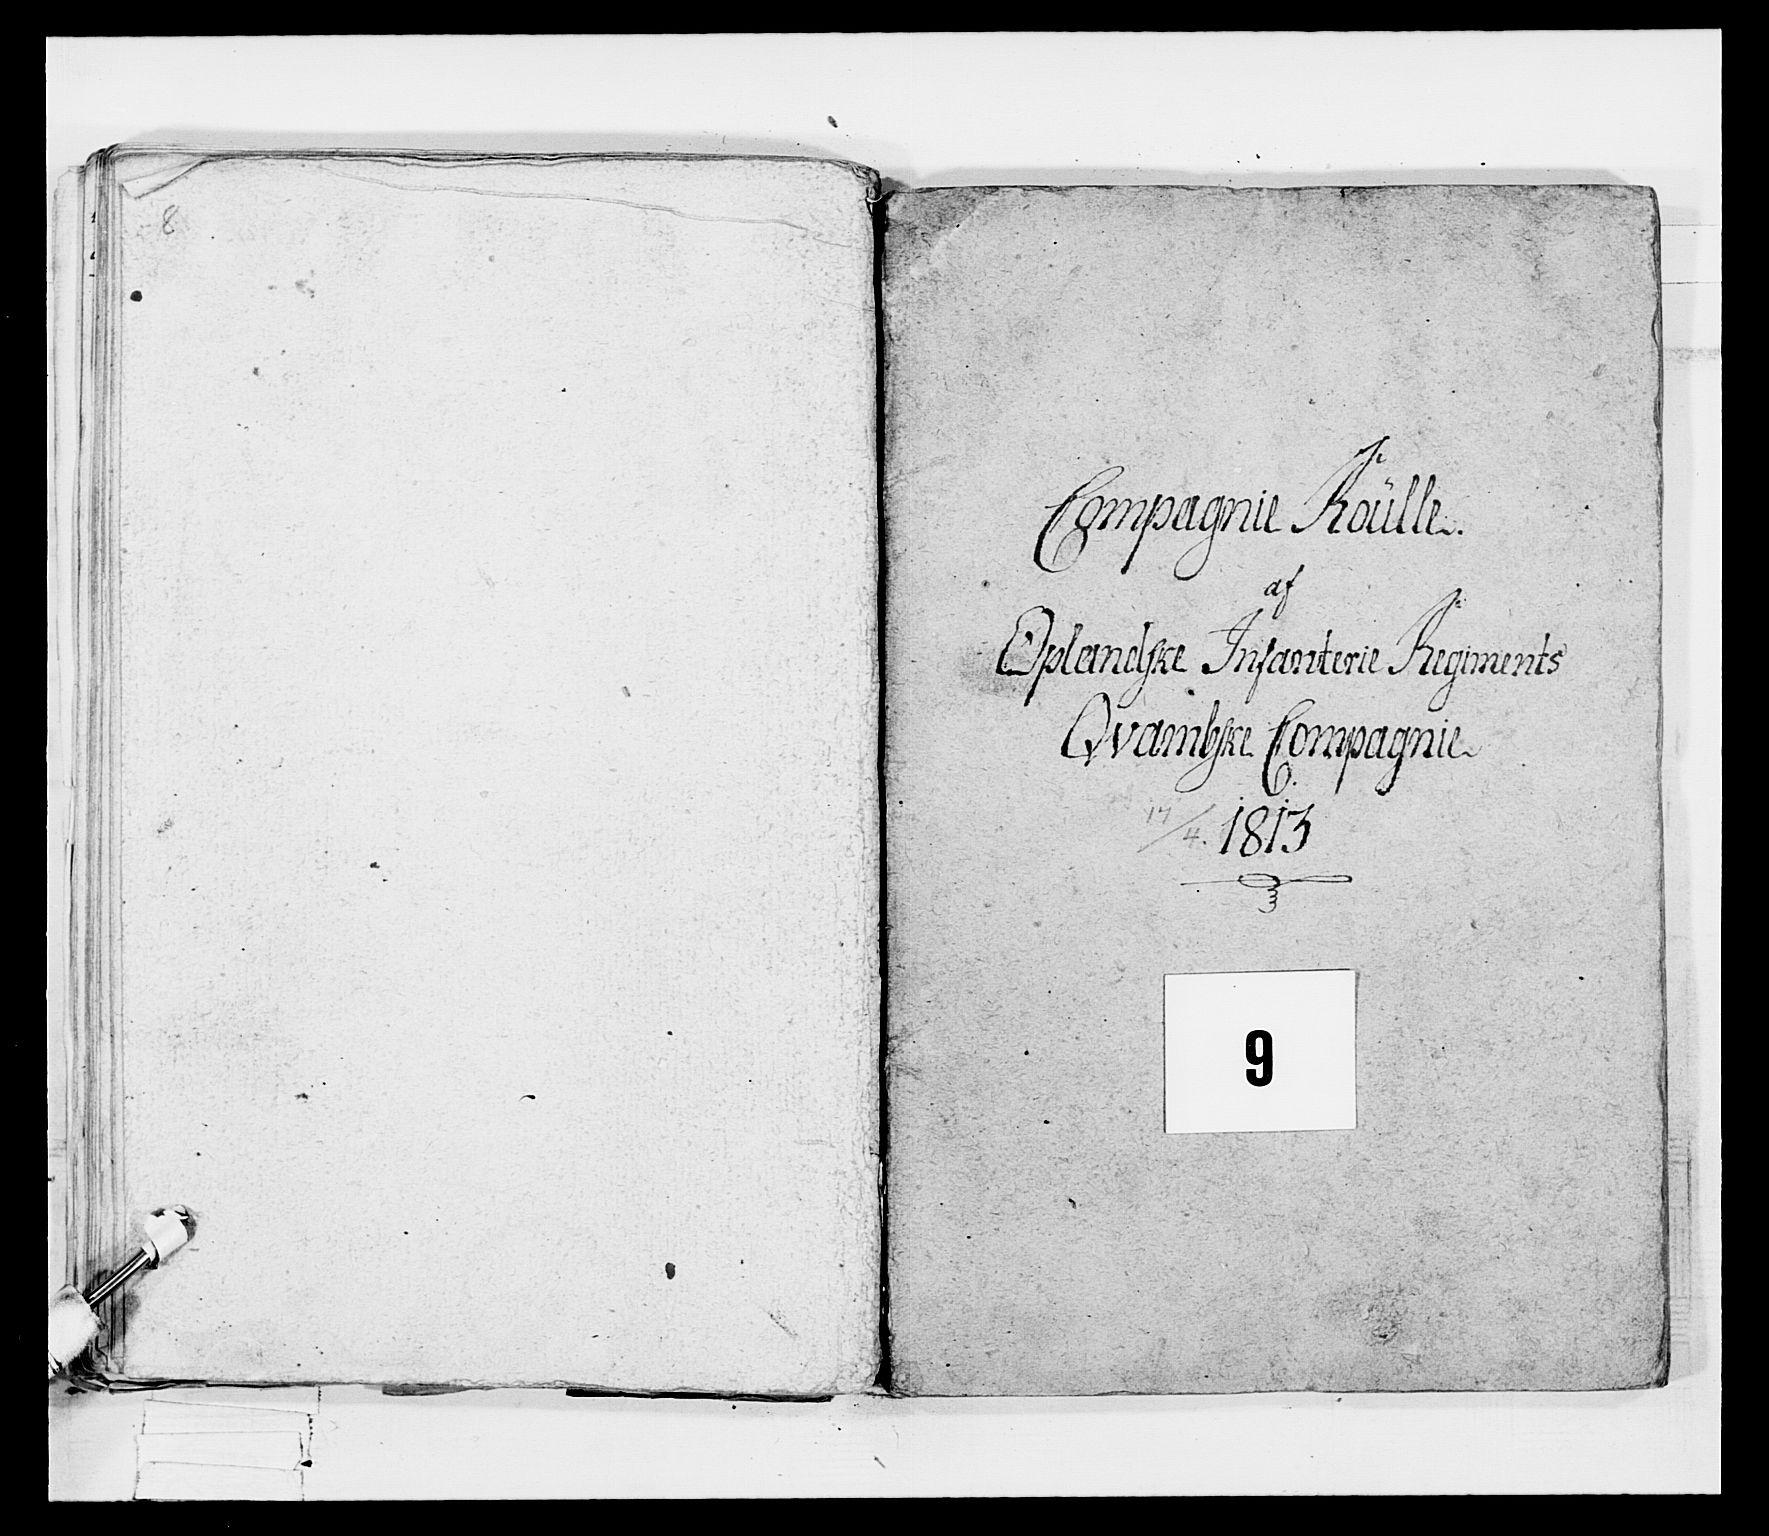 RA, Generalitets- og kommissariatskollegiet, Det kongelige norske kommissariatskollegium, E/Eh/L0069: Opplandske gevorbne infanteriregiment, 1810-1818, s. 419